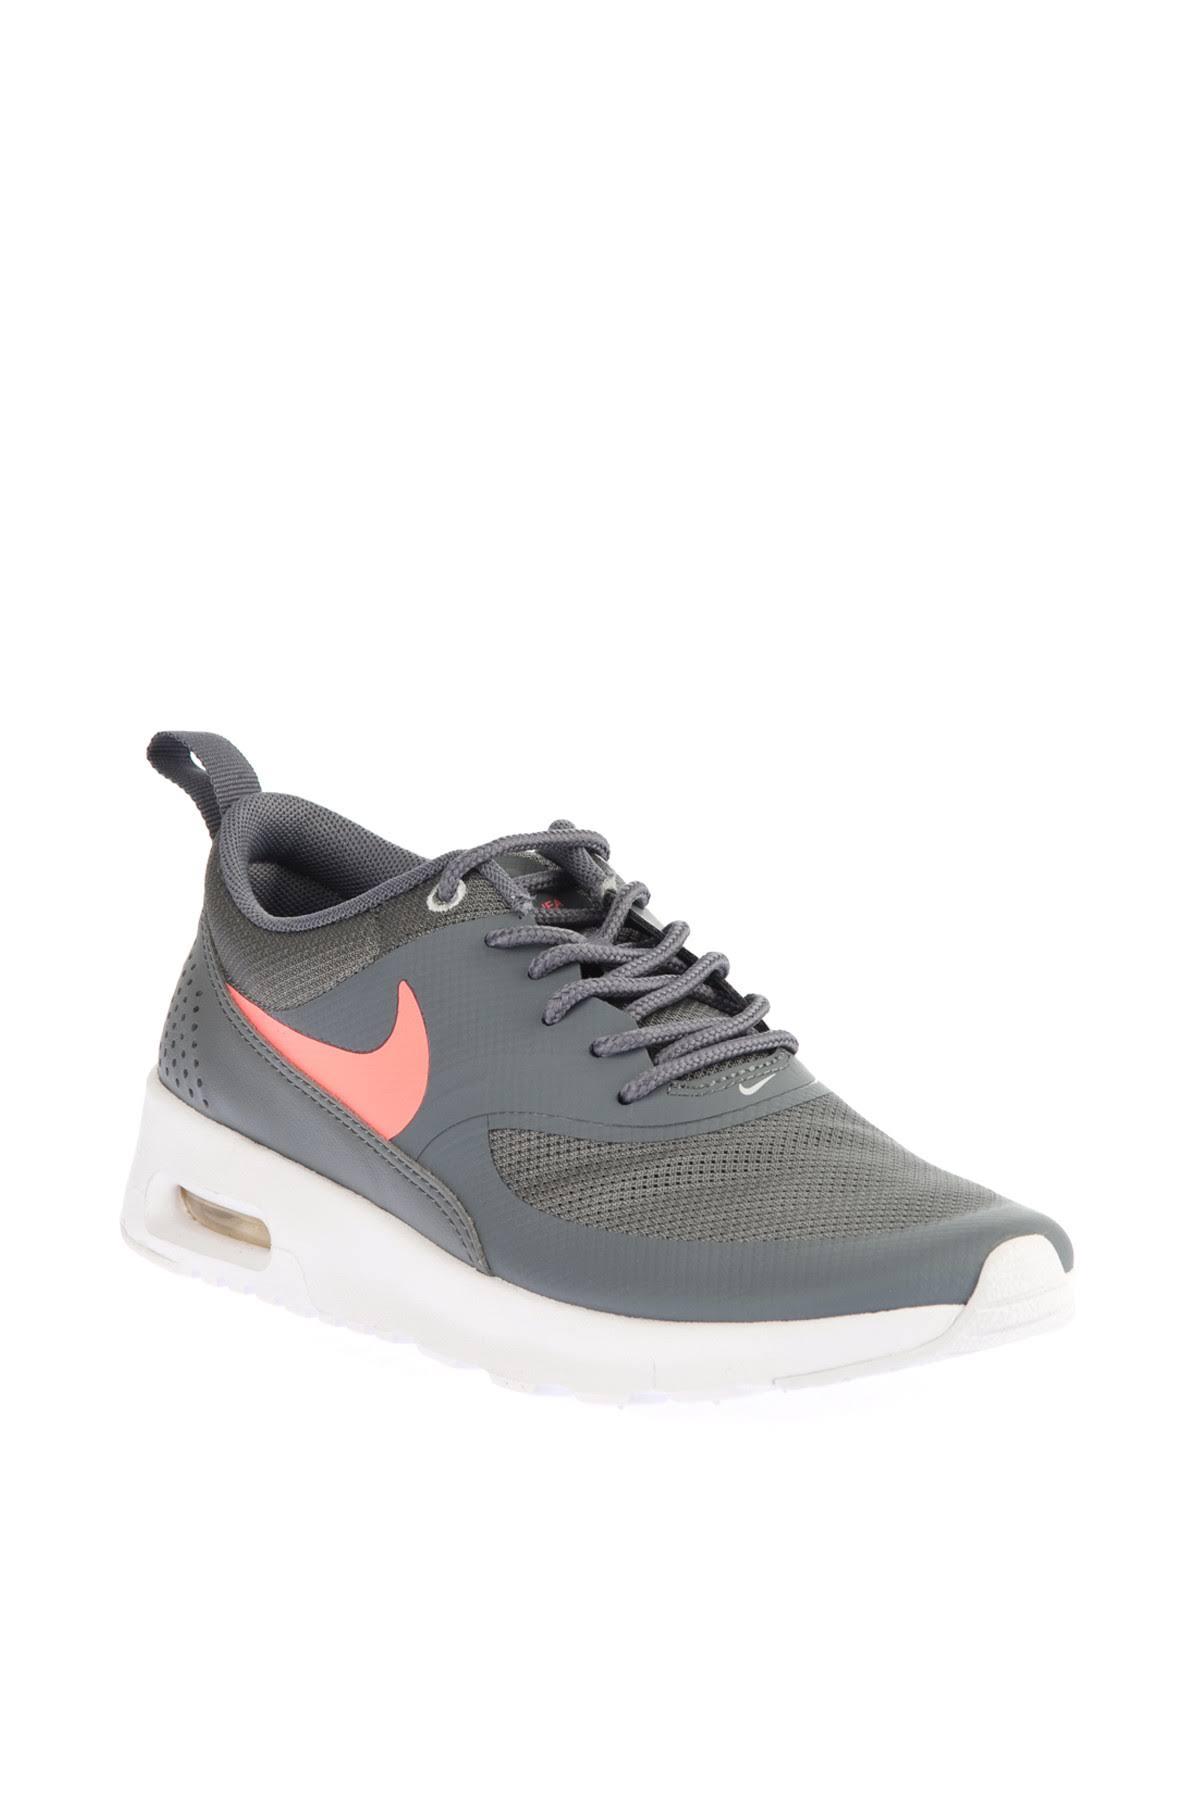 007 Spor Max Air Ayakkabı Thea Kadın gs Nike 814444 Hqw8USW